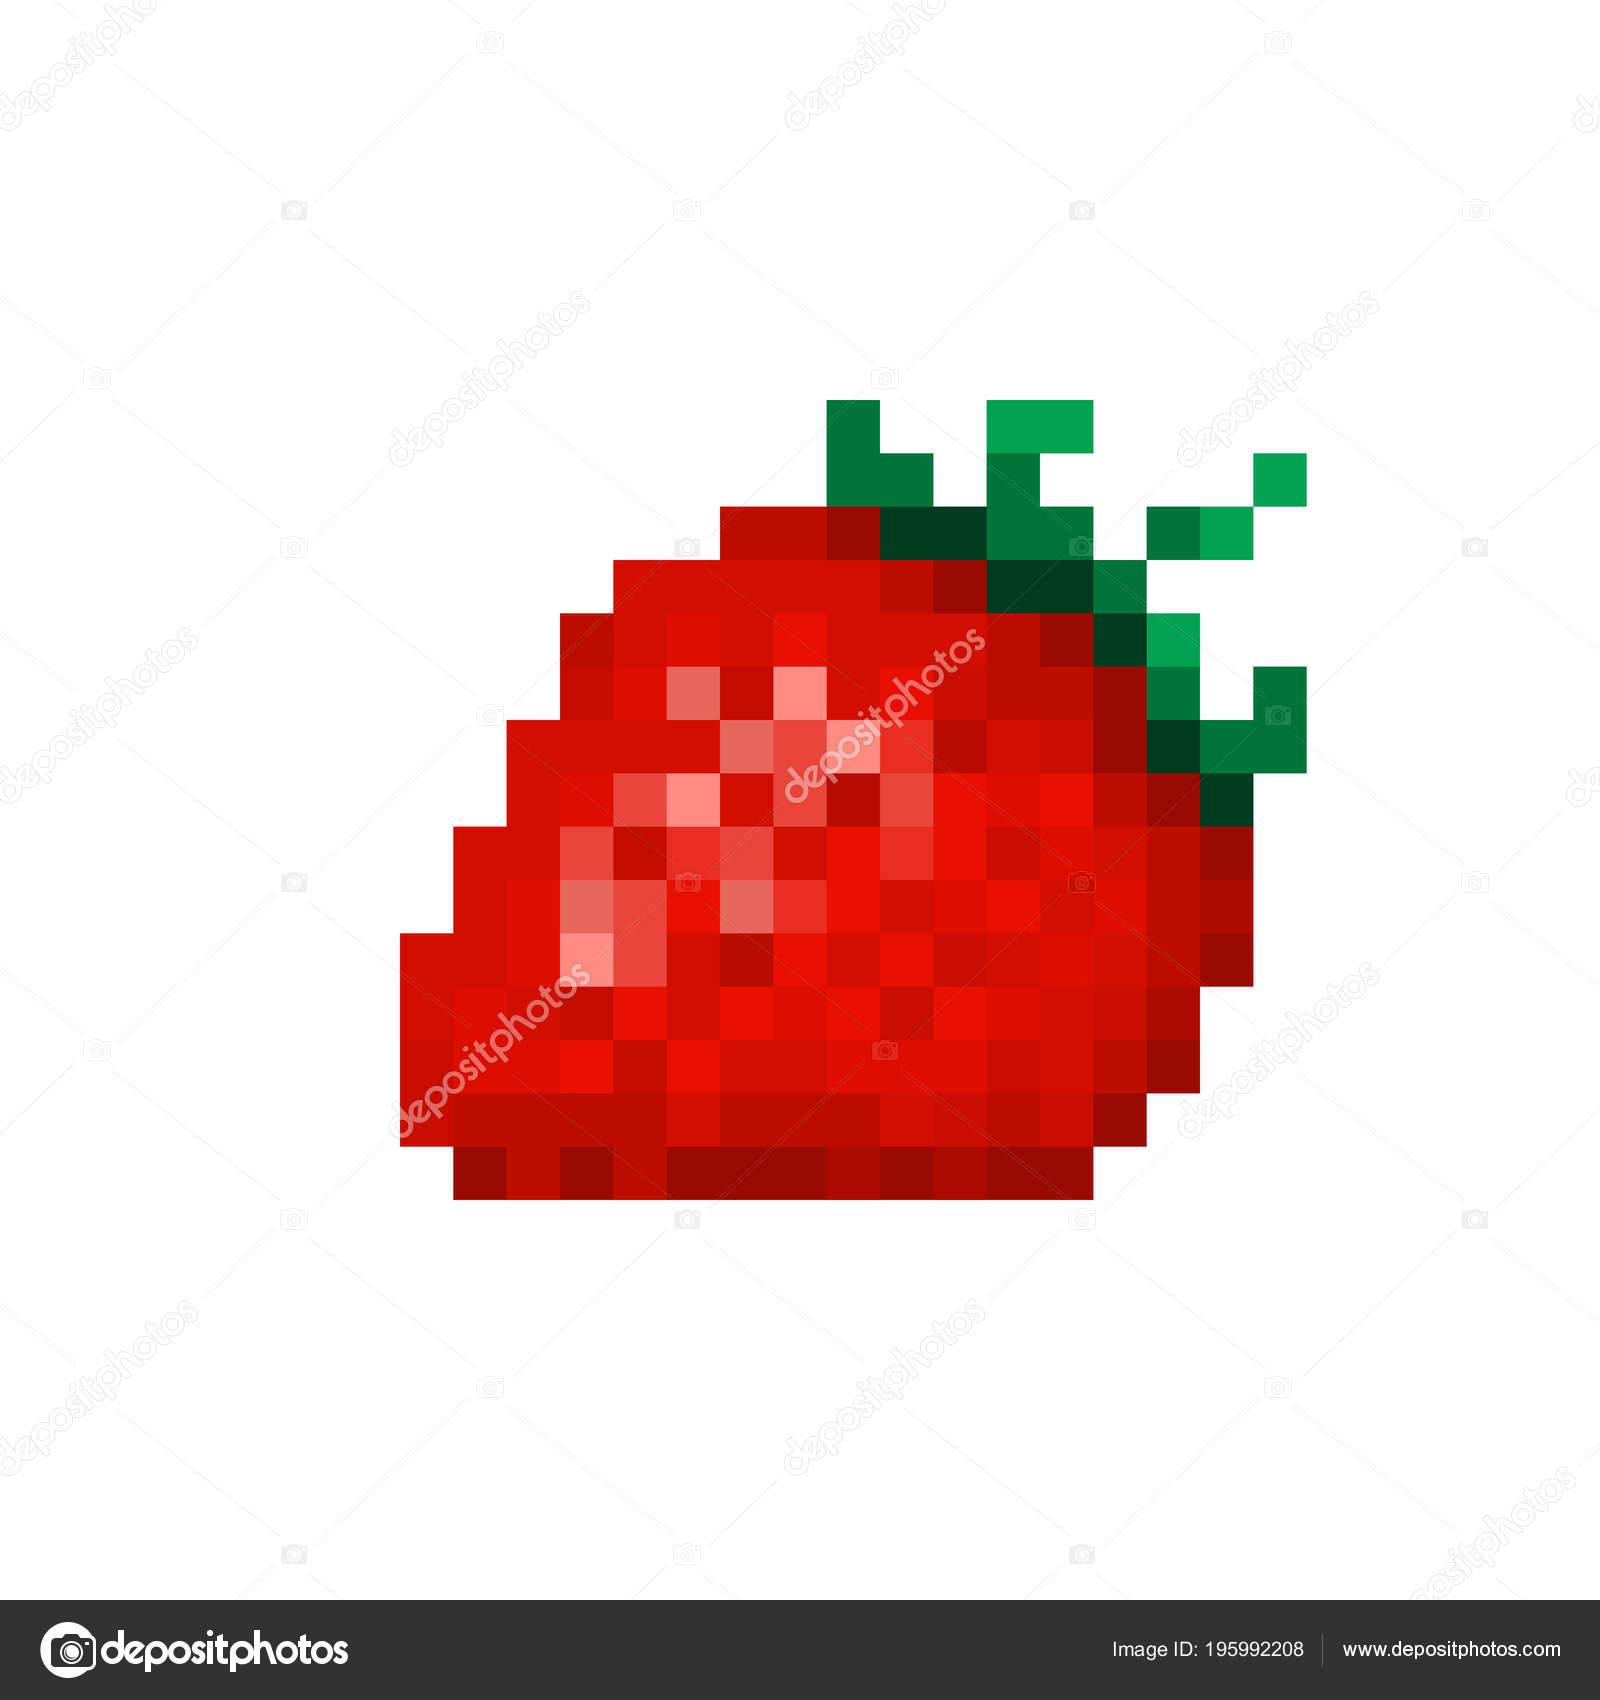 Red Strawberry Pixel Art Icon Isolated White Background Jam tout Pixel Art Fraise